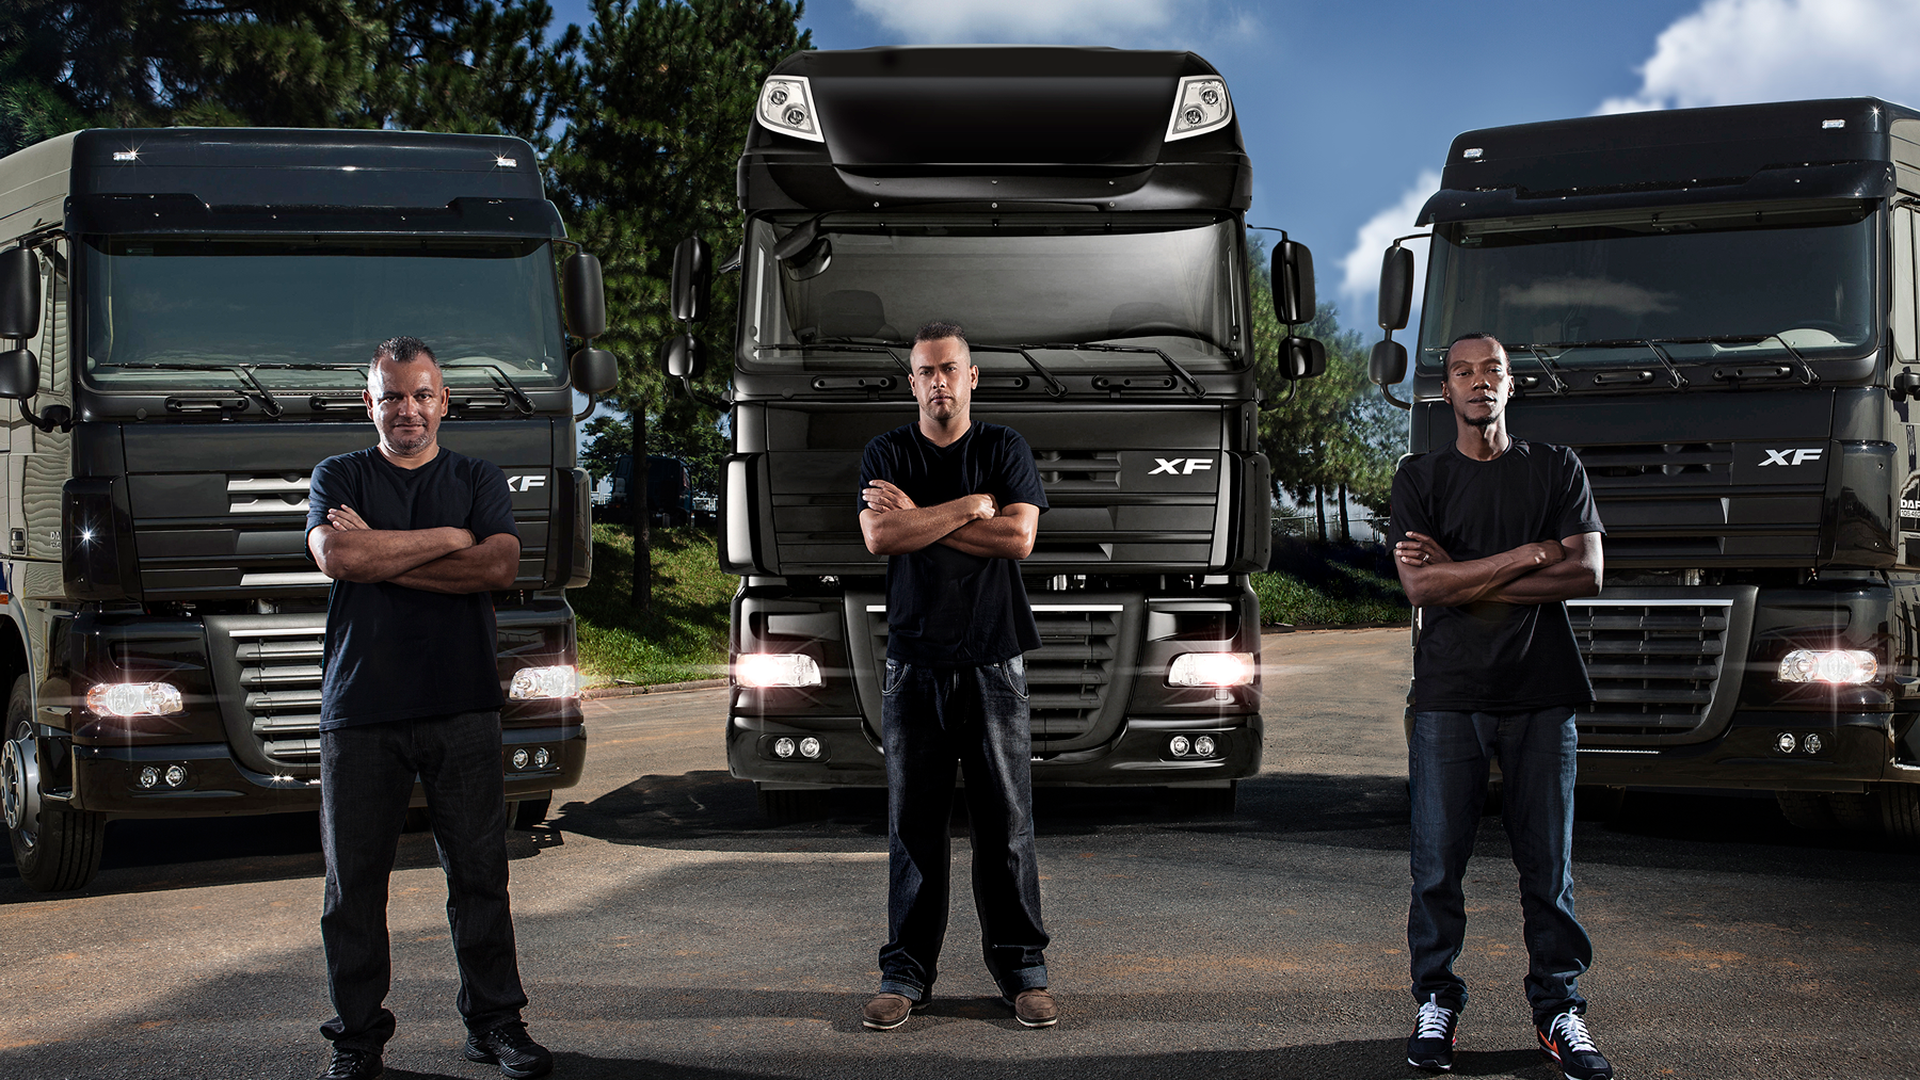 Techmeme: Source: Brazilian on-demand trucking platform